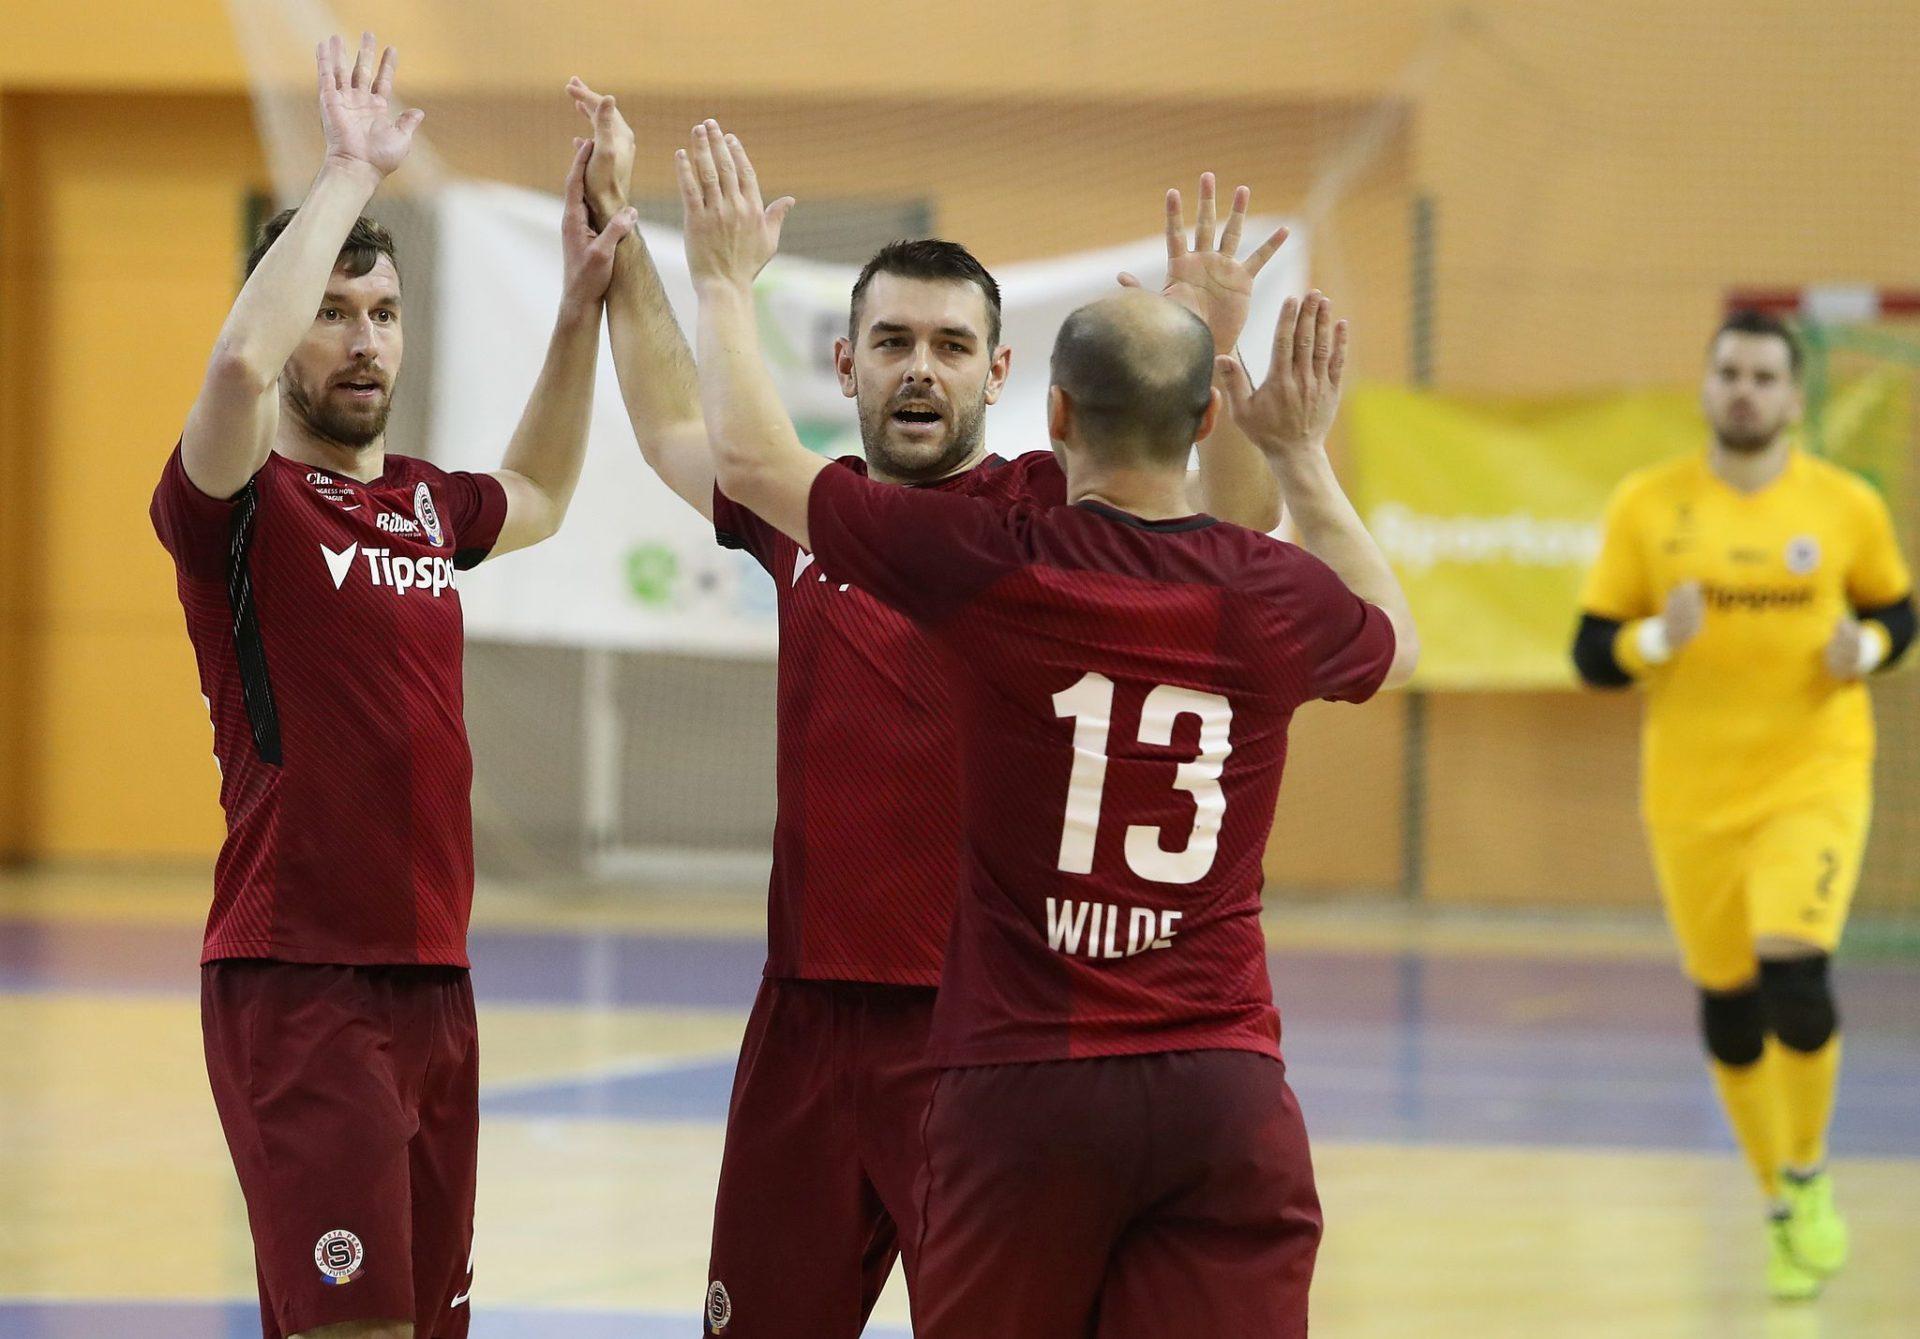 Sparta jde do čela tabulky, Plzeň porazila 6:2